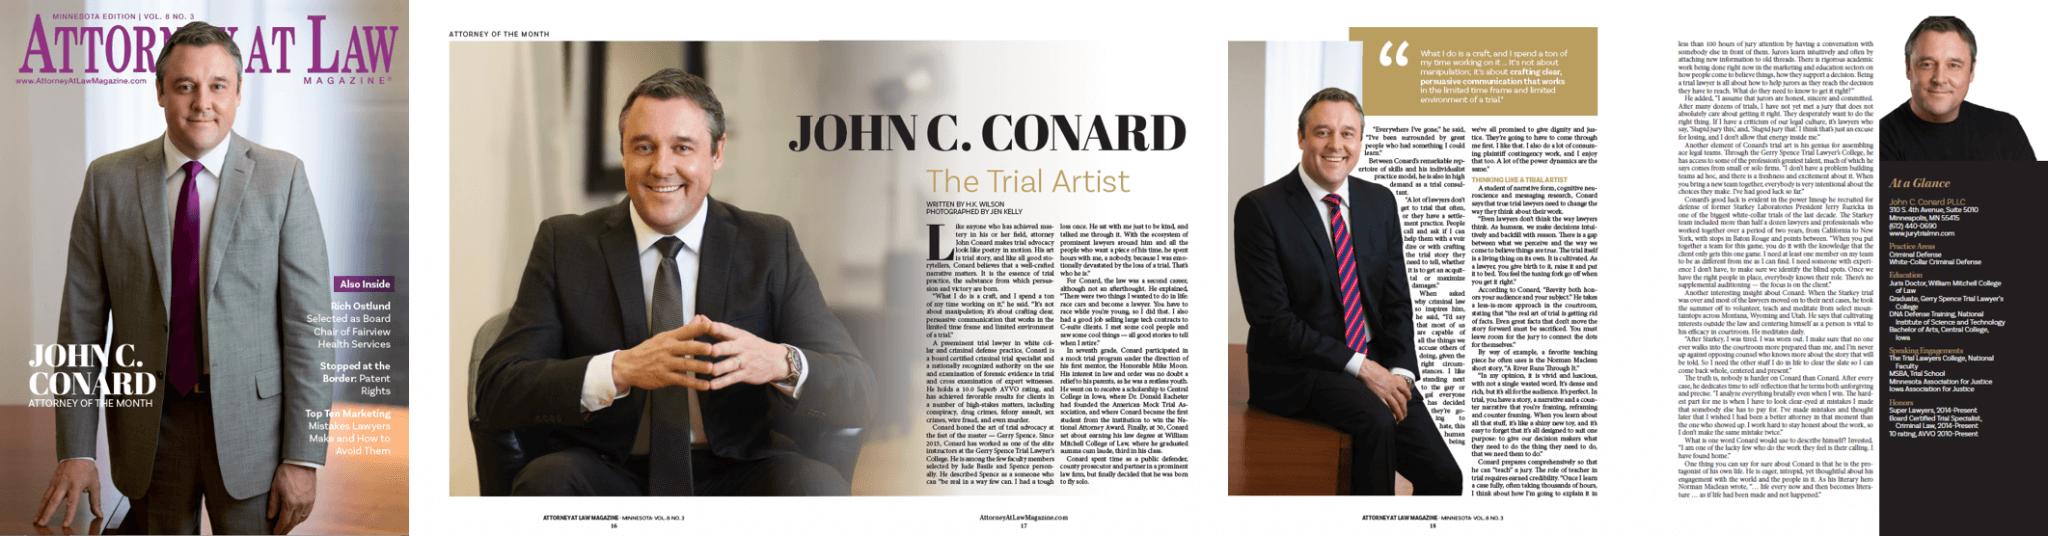 John Conard